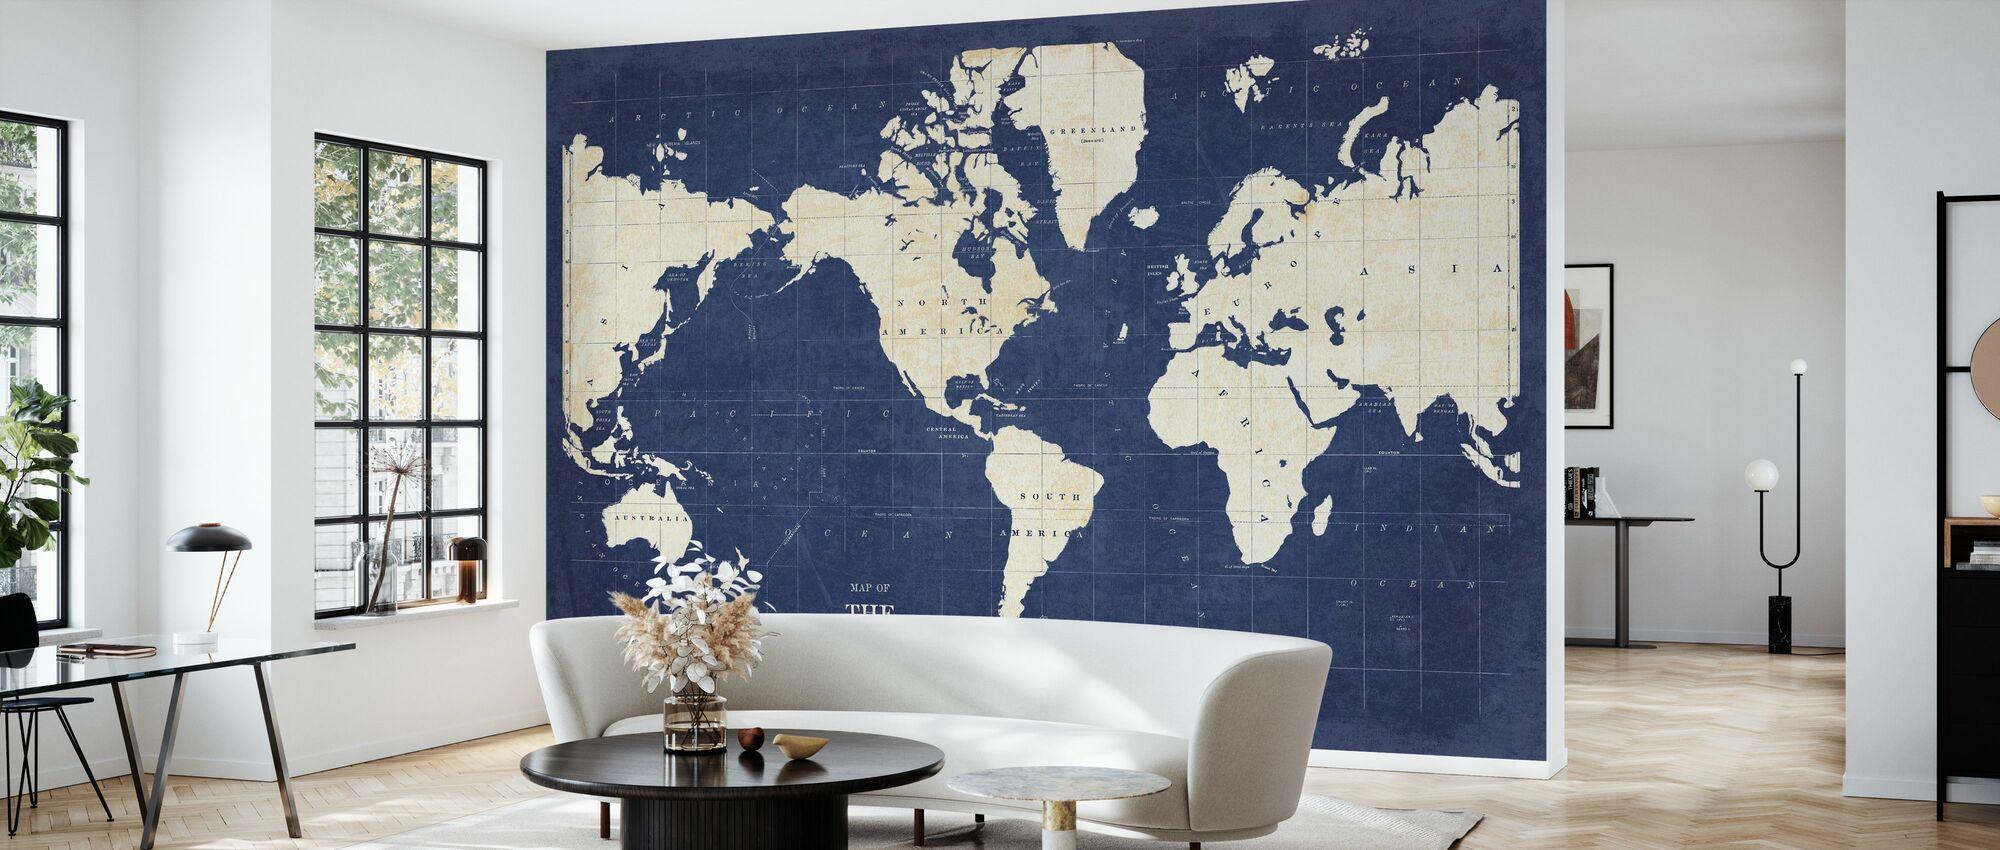 Blueprint World Map - No Border - Wallpaper - Living Room